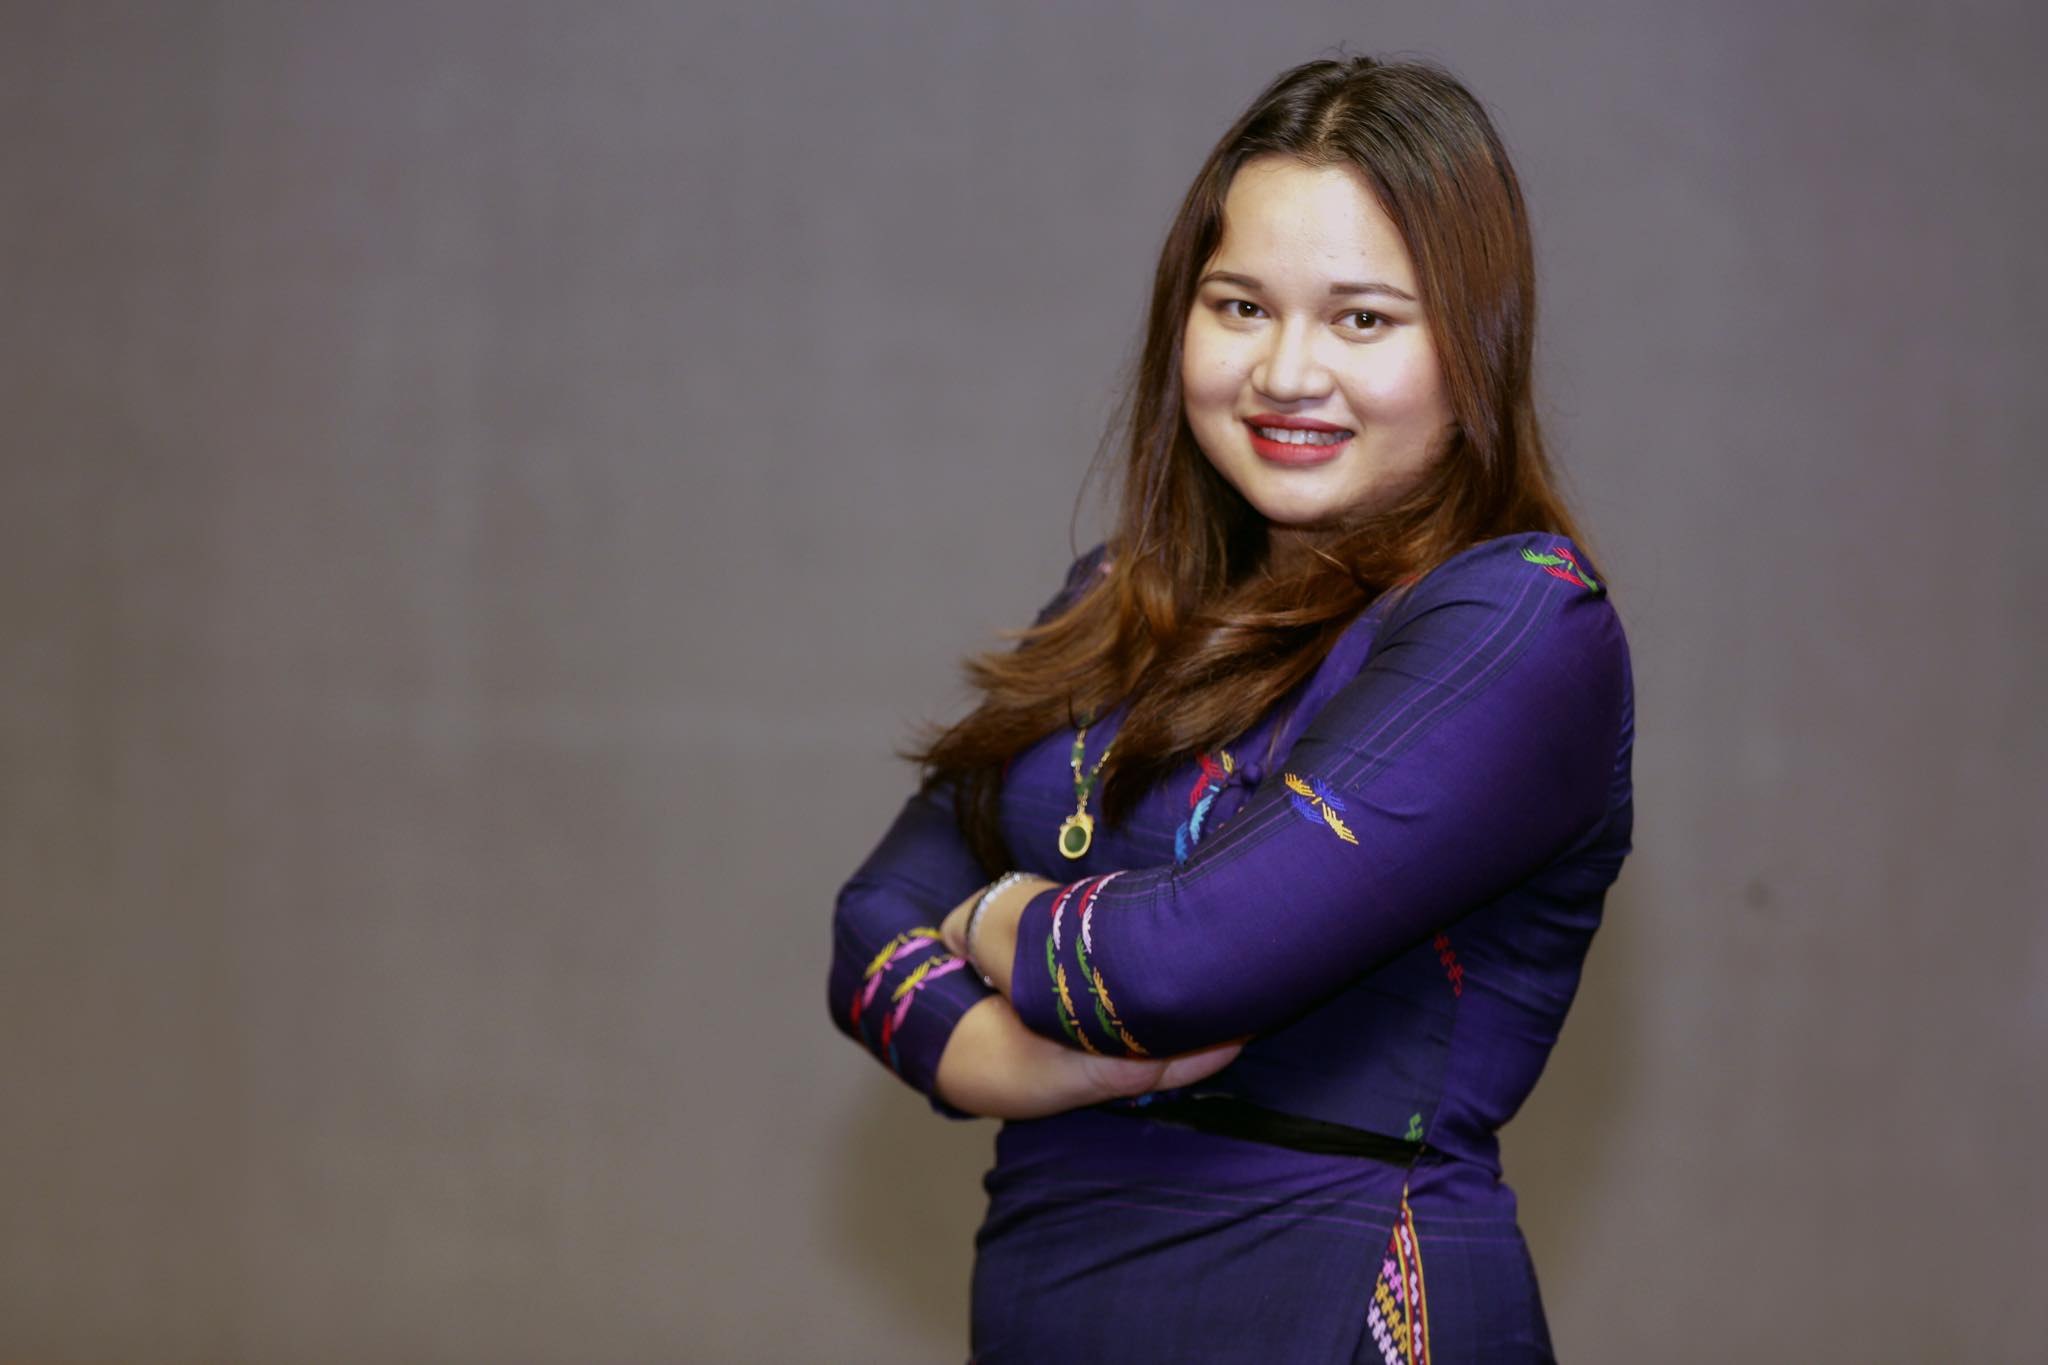 Daw Kyu Laie Thu